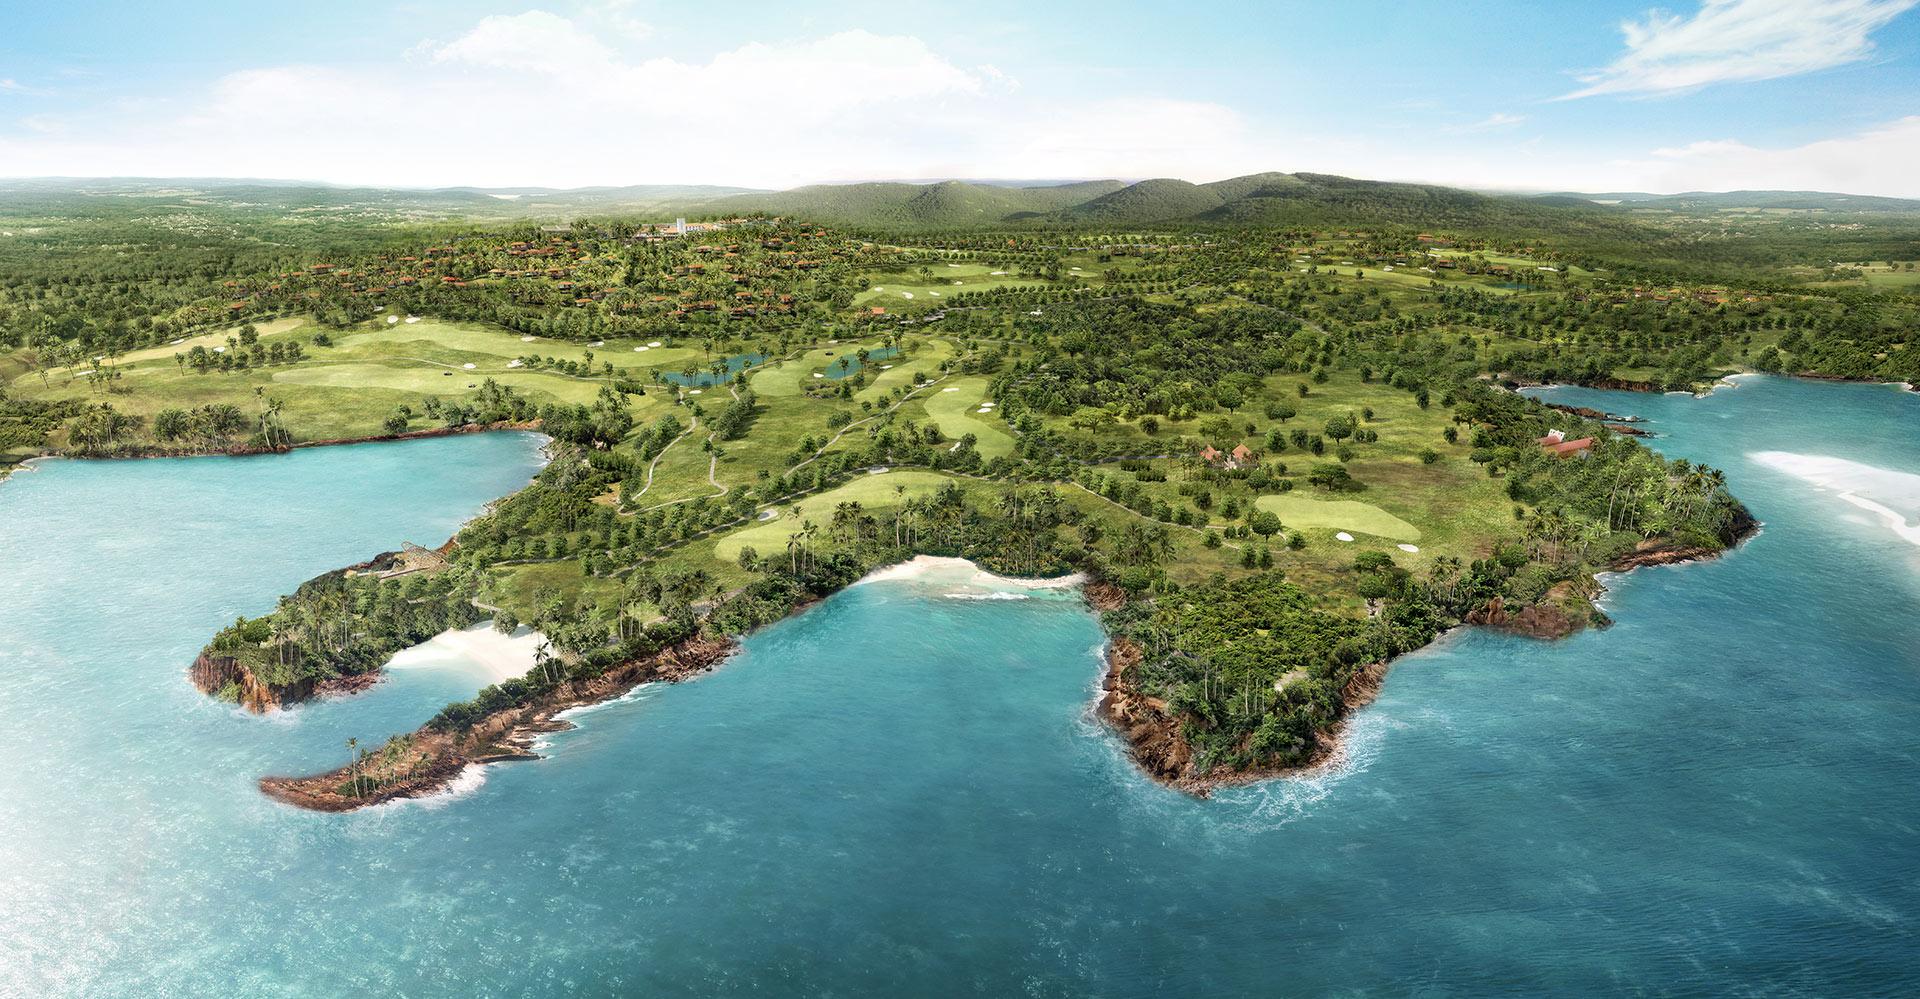 Four Seasons Golf Resort Residences - Goa India - WATG -Aerial